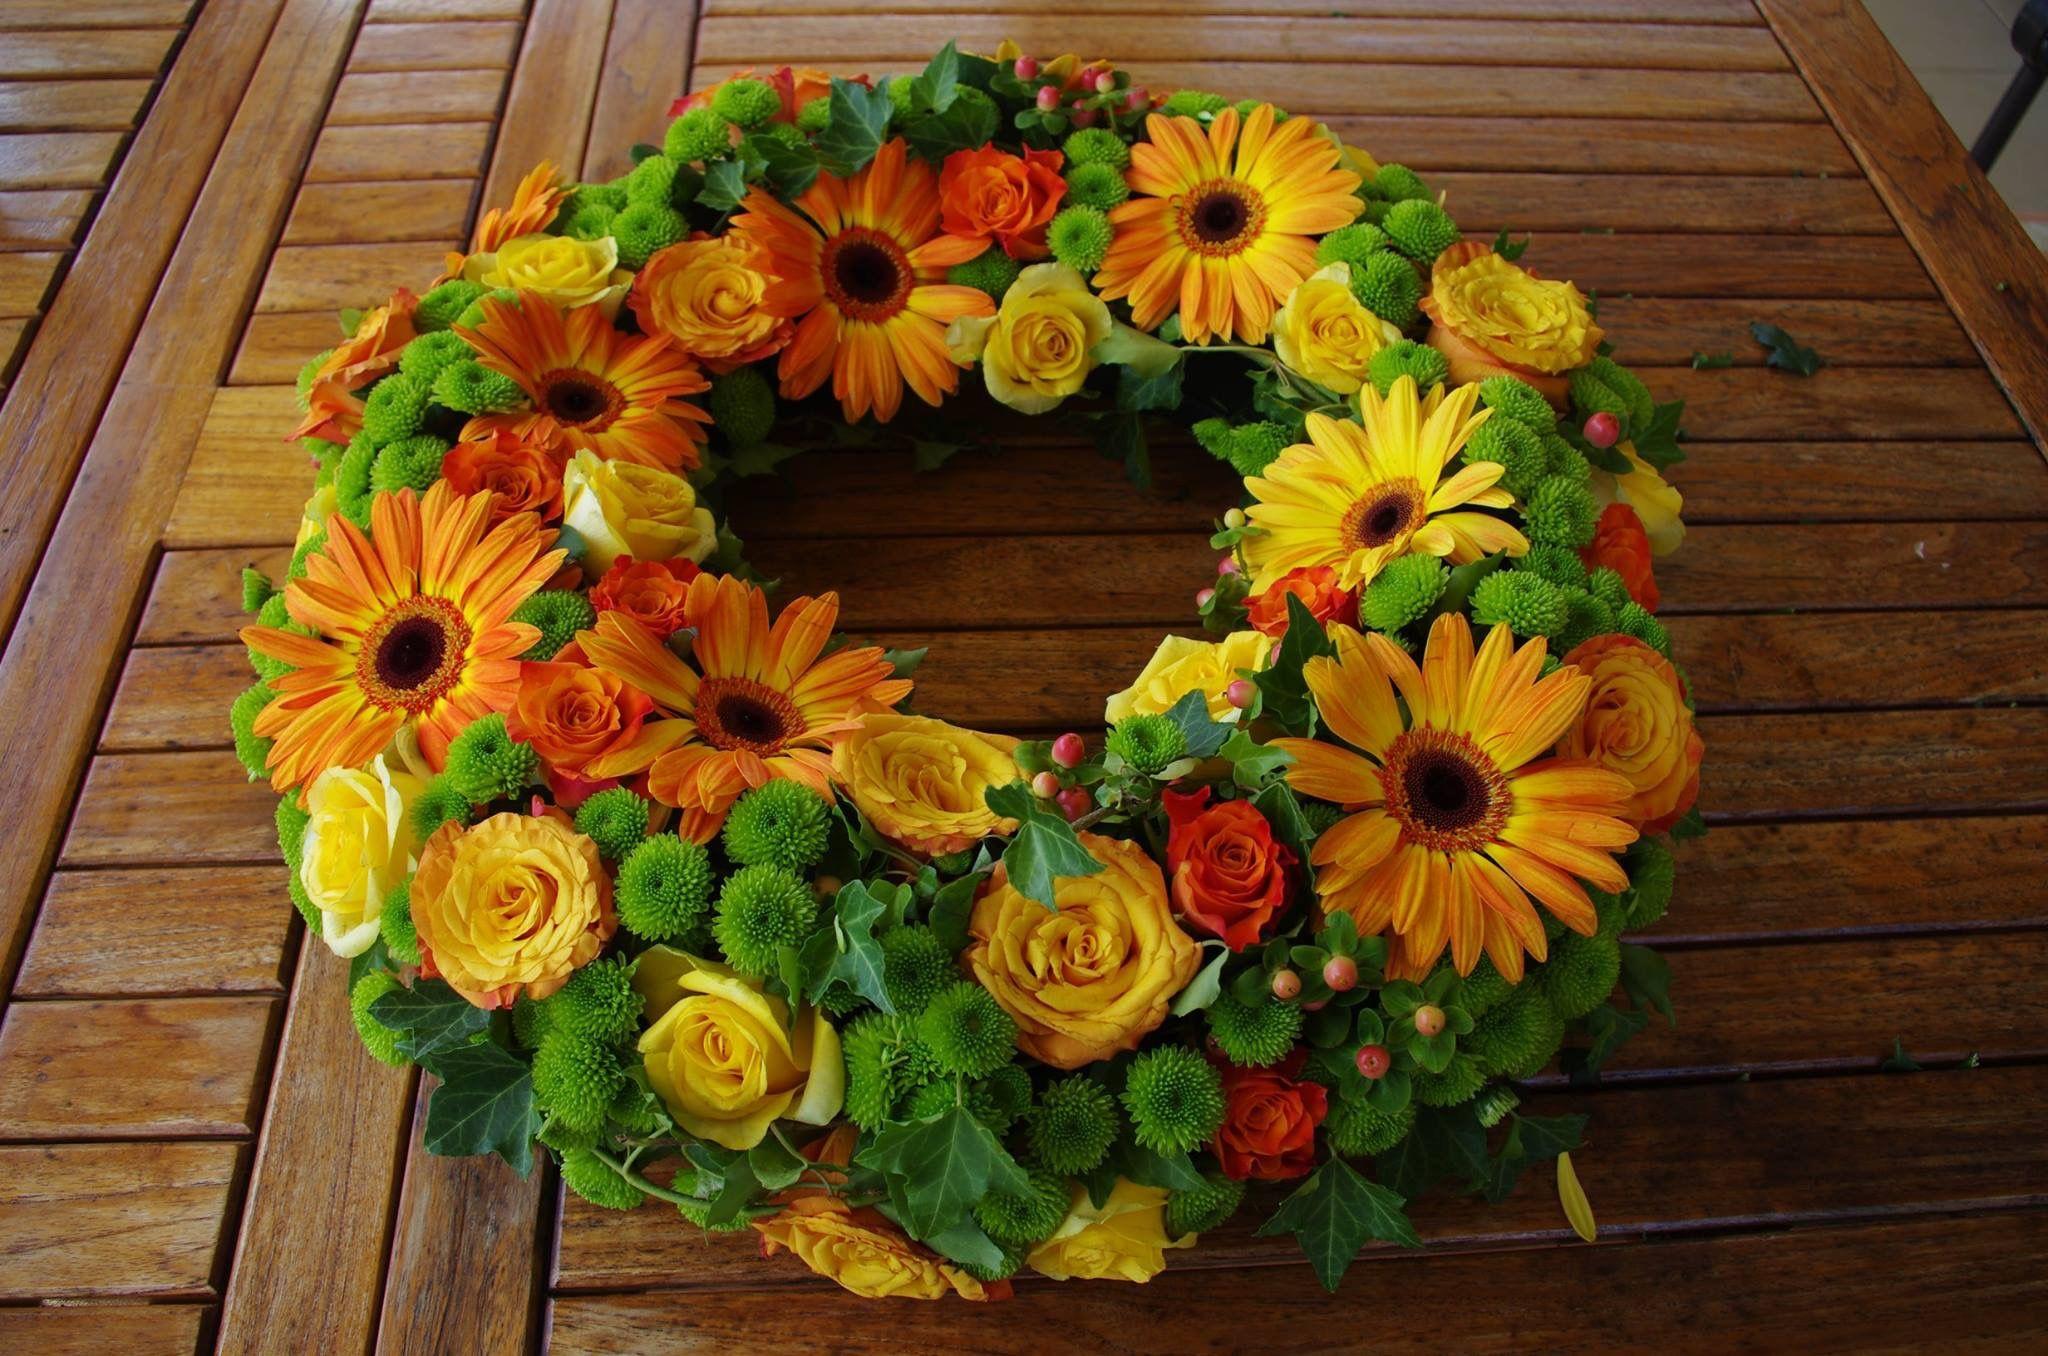 Sympathy Design Open Wreath In Orangeyellow With Gerbera Roses